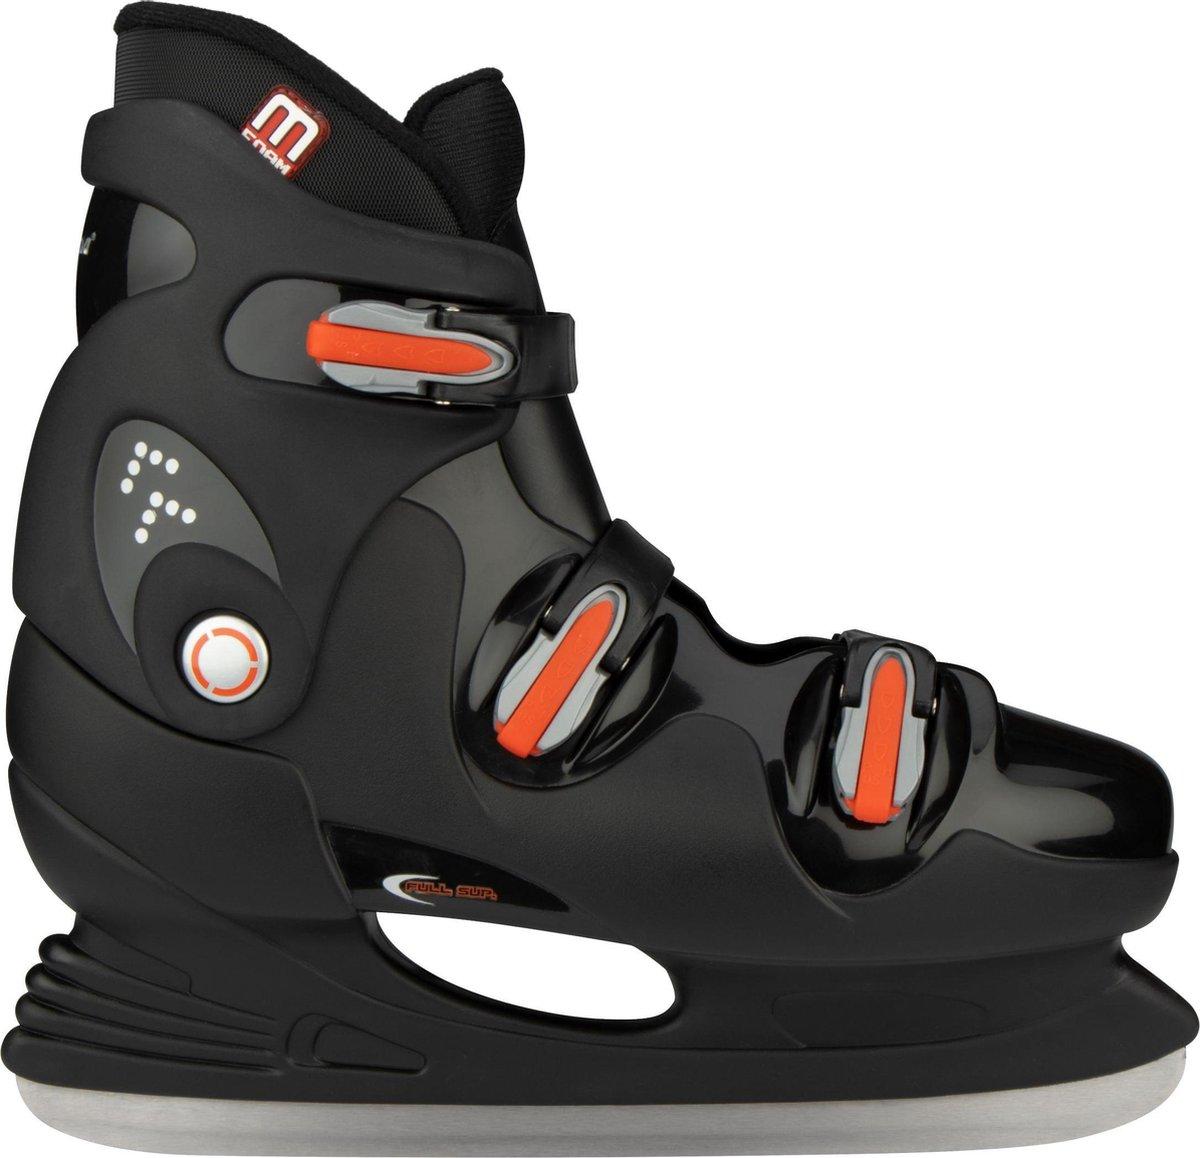 Nijdam IJshockeyschaats - Hardboot - Zwart/Zilver/Rood - 41